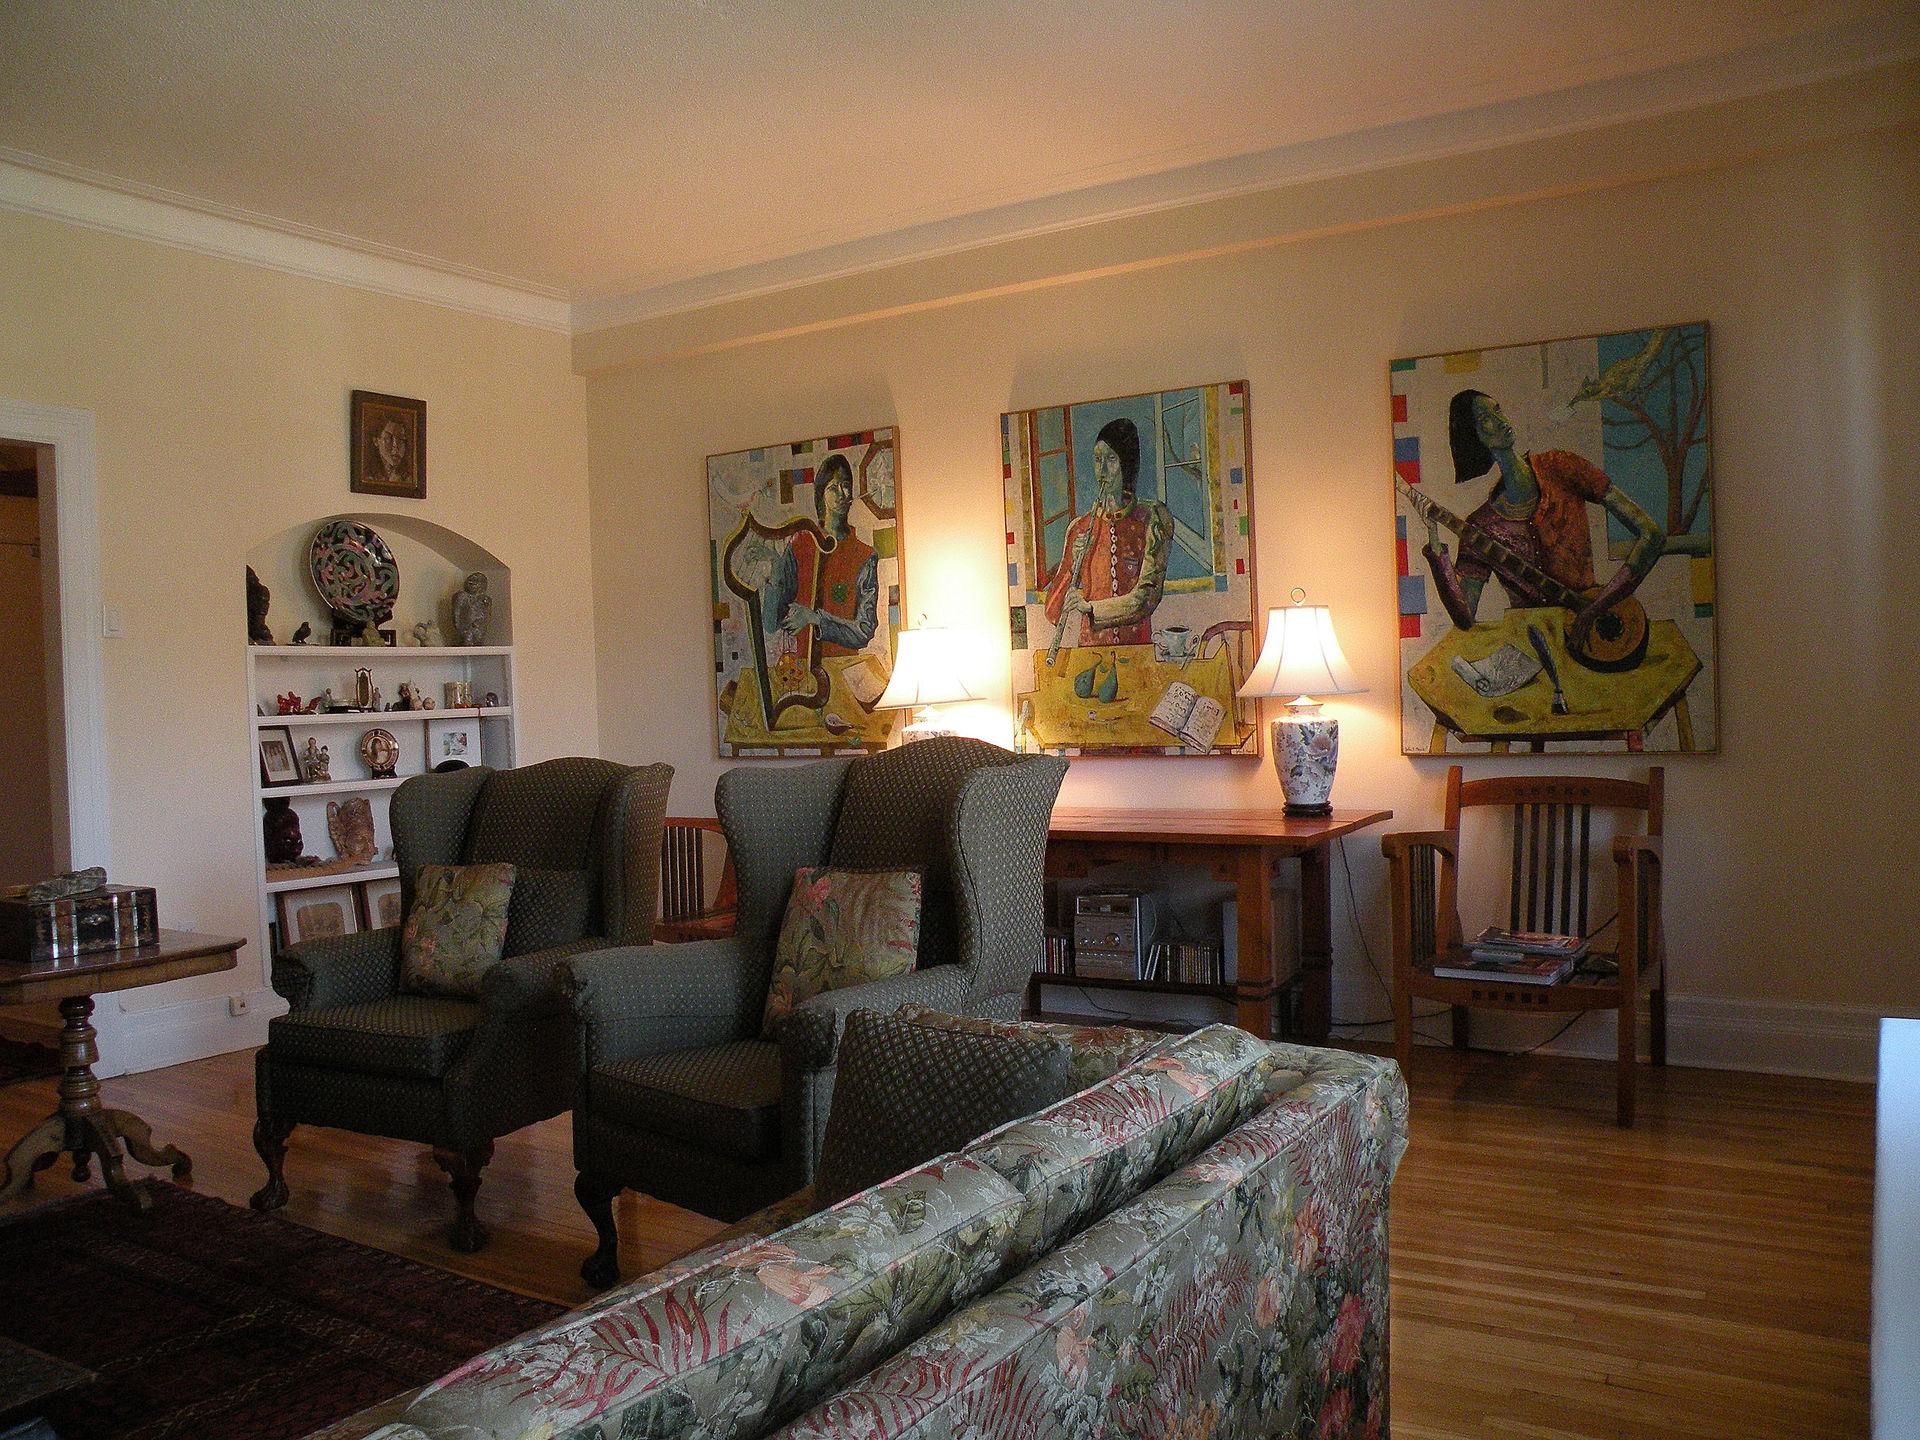 Luxury Haddon Hall Apartment - Downtown Montreal - Home Exchange